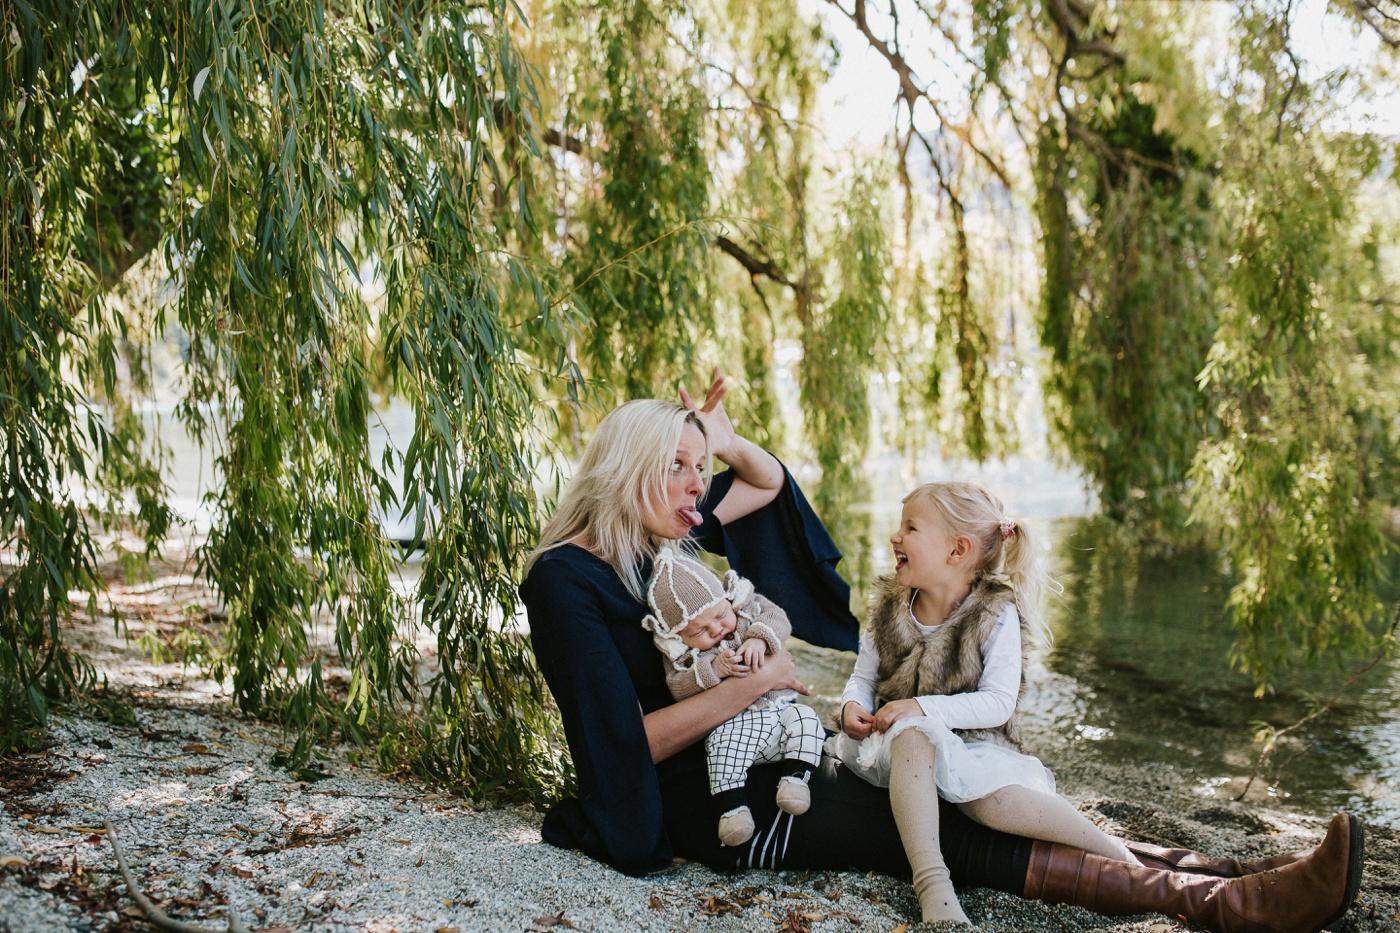 Blake-Lily-Rolig-Lekfull-Familjesession-Familjefotograf-Stockholm-Orebro_22